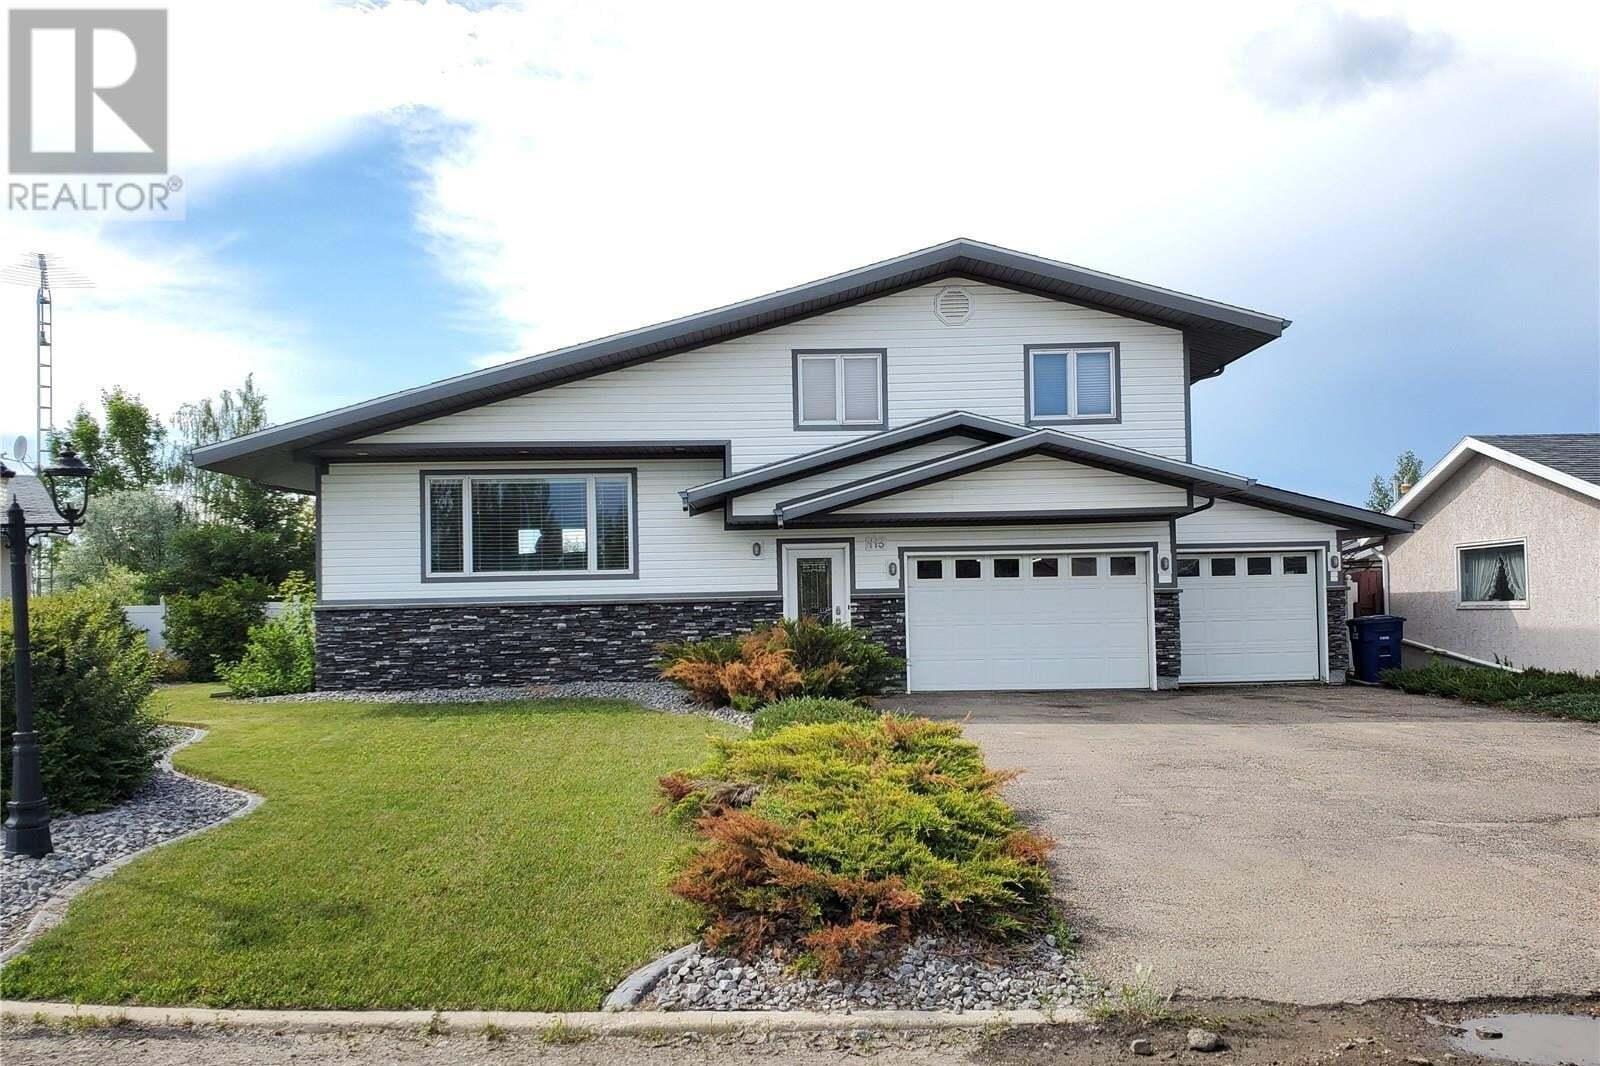 House for sale at 115 Jubilee By Unity Saskatchewan - MLS: SK815296